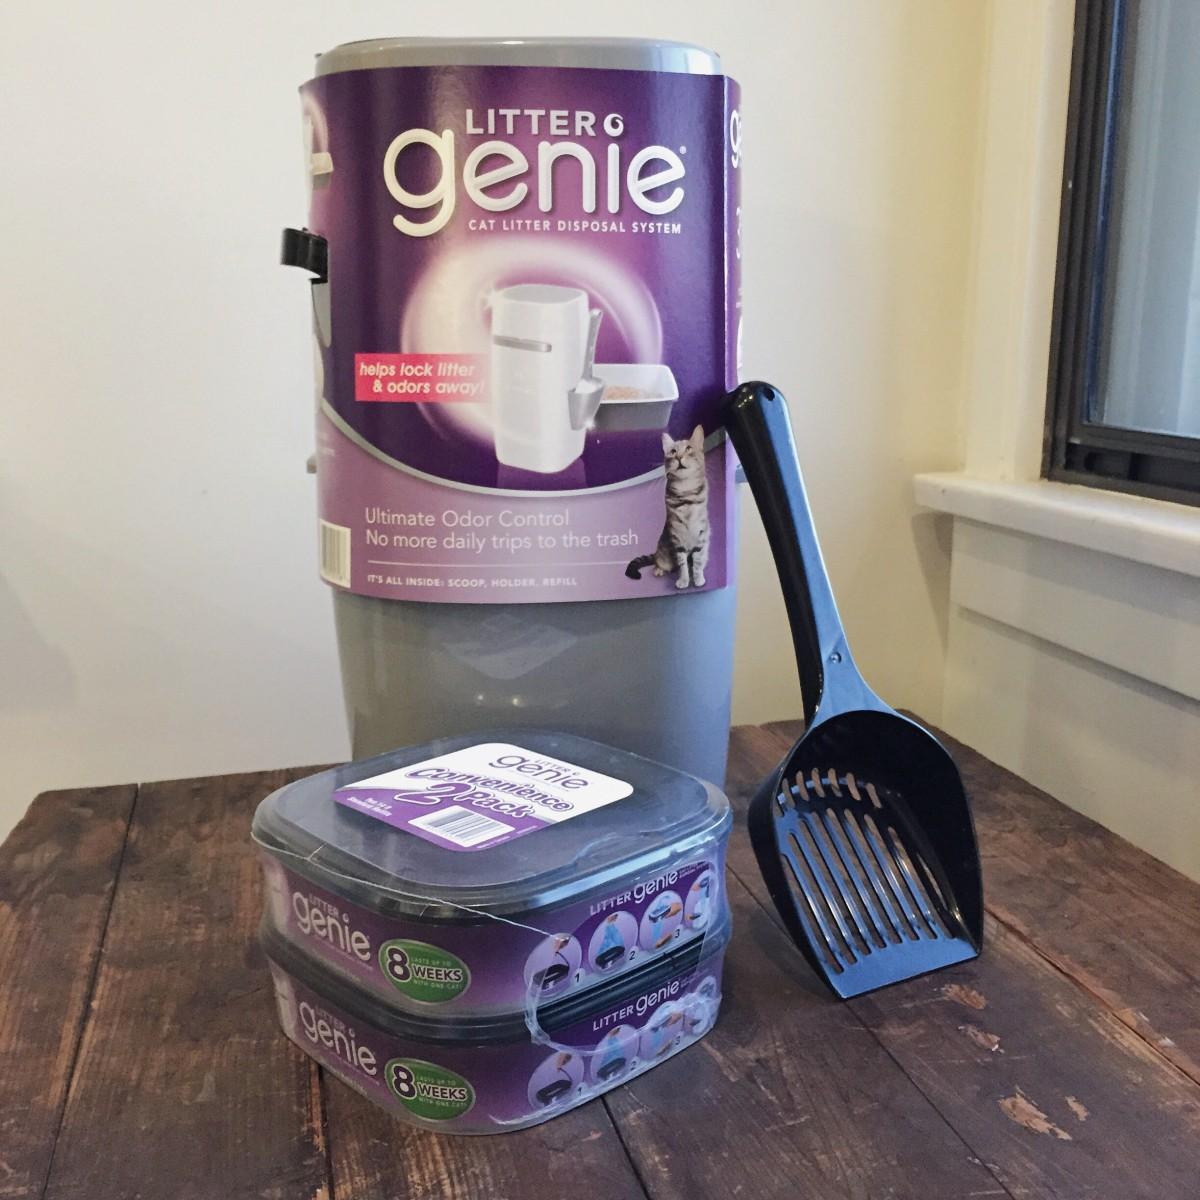 Litter Genie and Litter Genie Plus